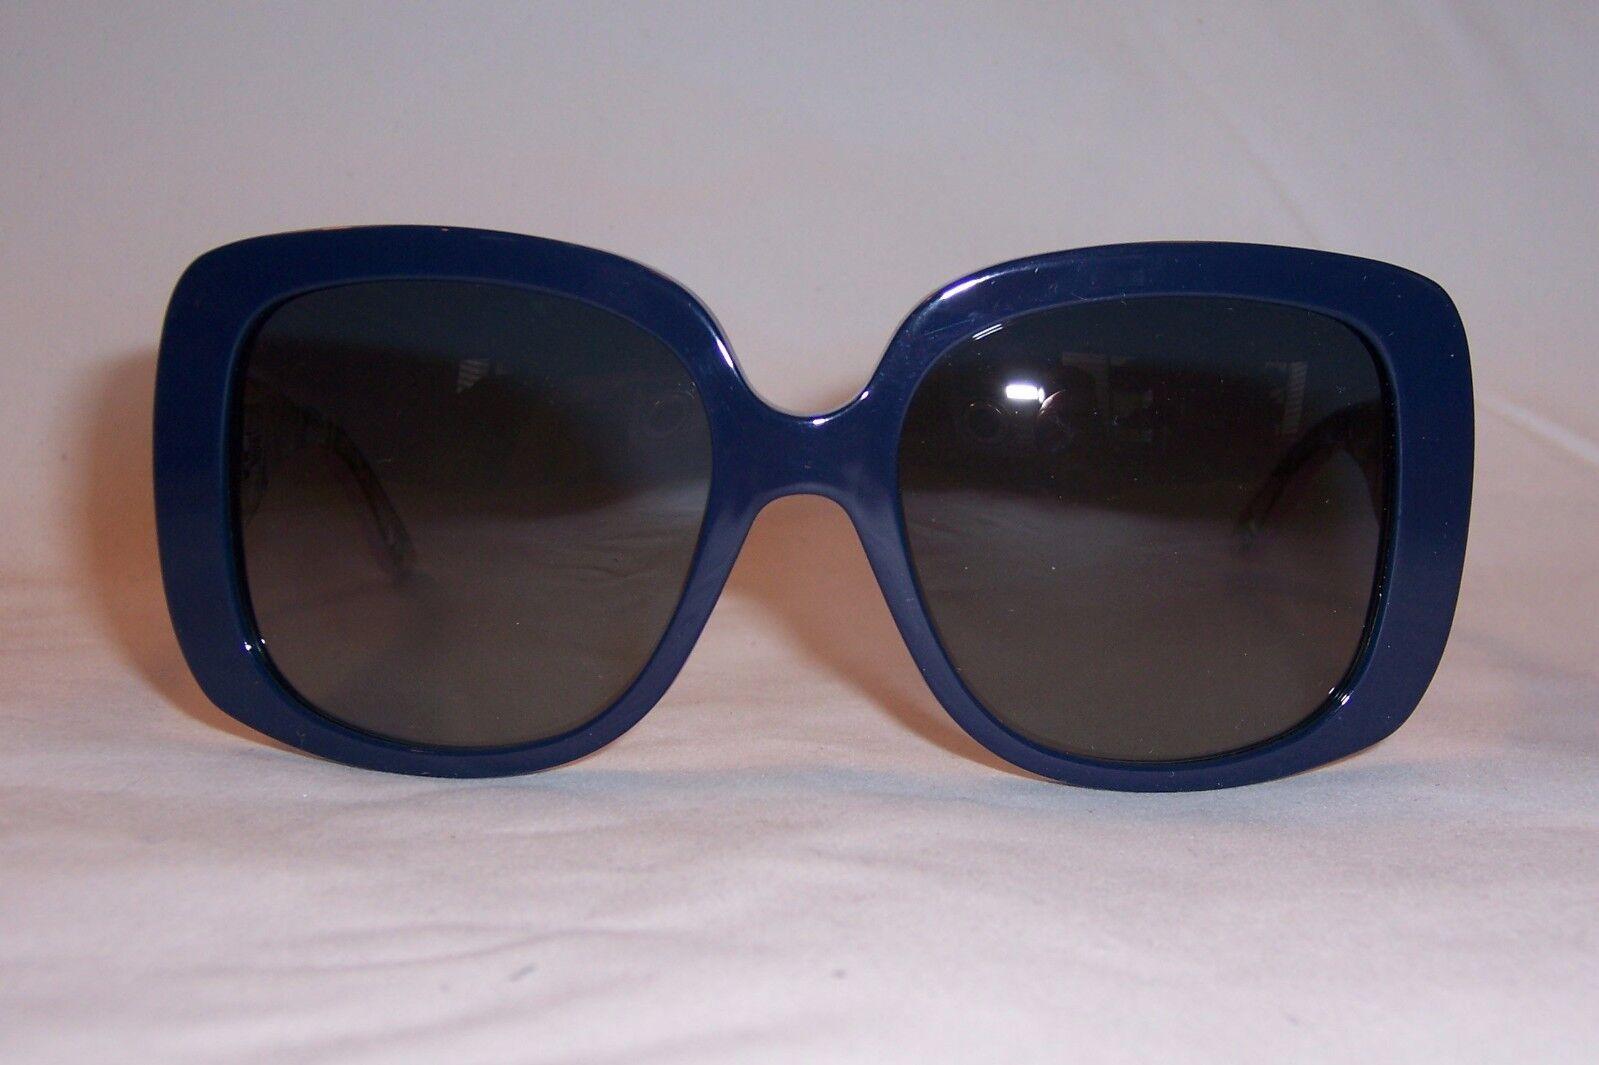 e8ade88abd26 Women Sunglasses Dior Dior Lady Lady 1o Nqh hd 56 for sale online